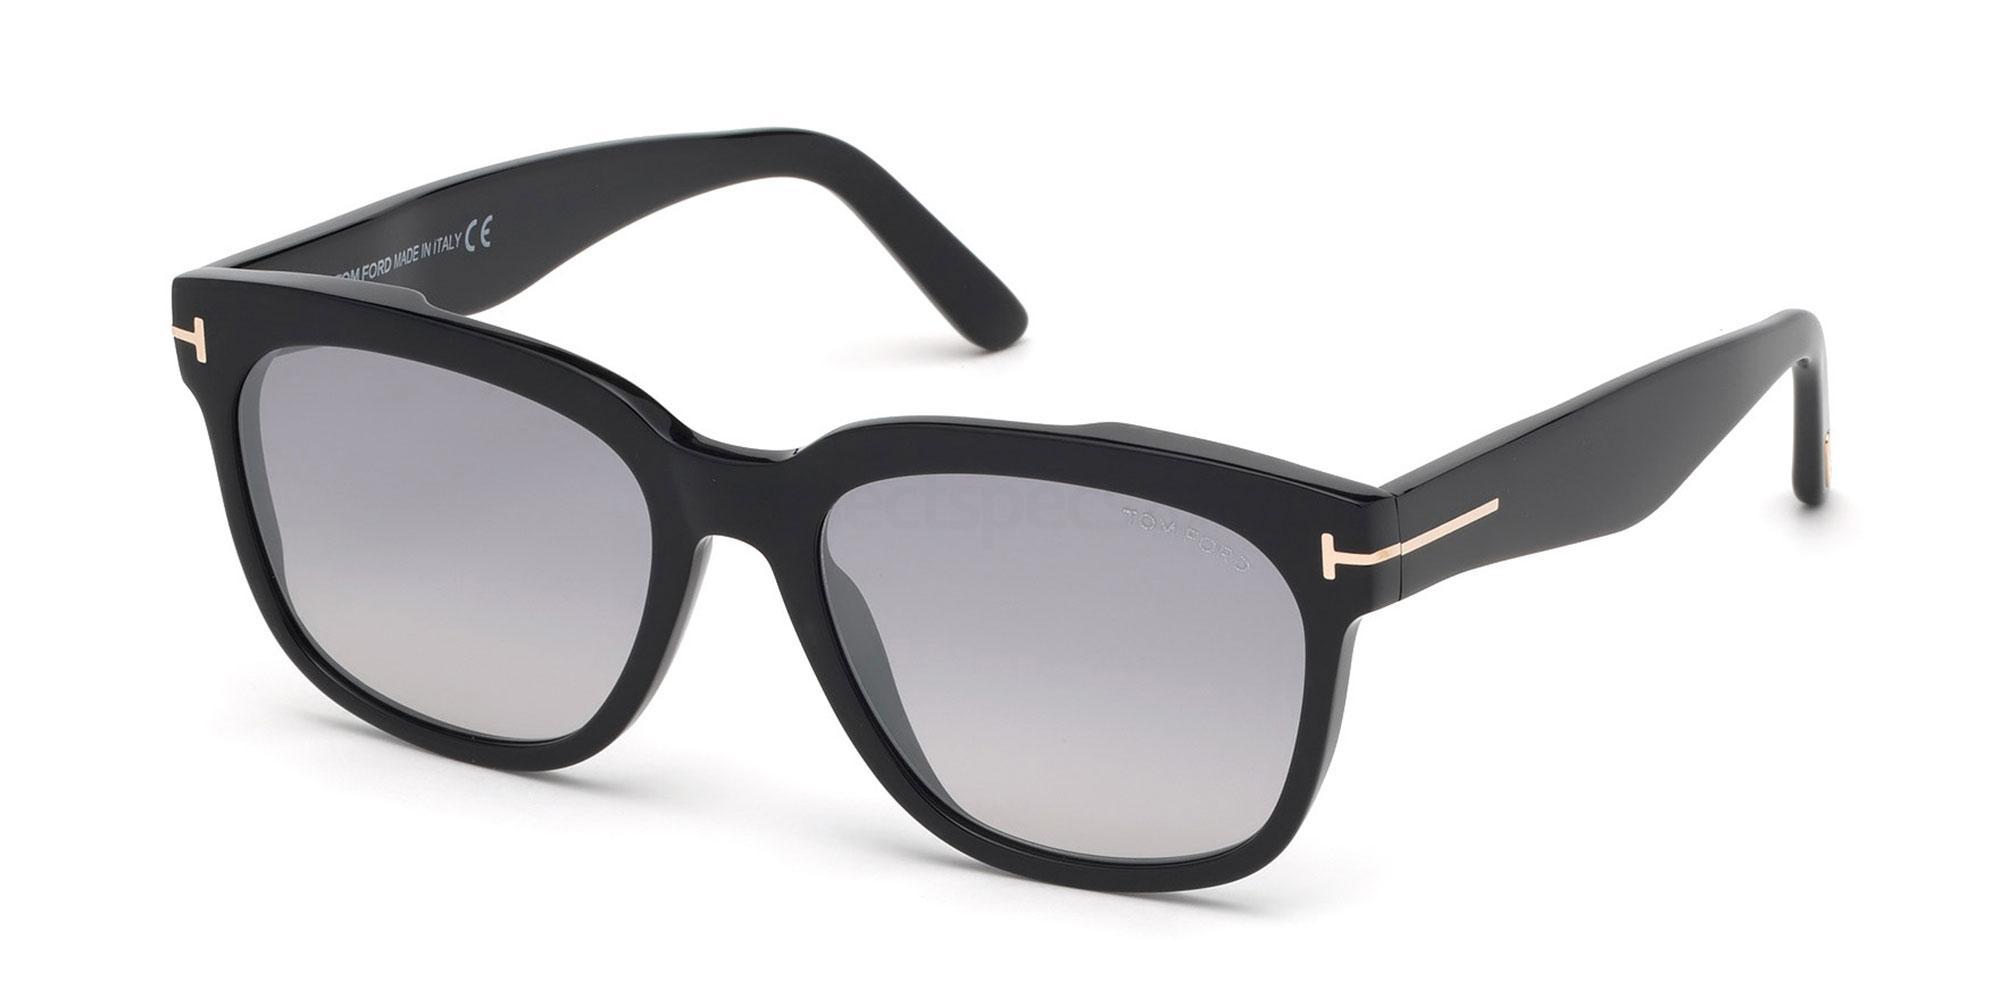 01C FT0714 Sunglasses, Tom Ford